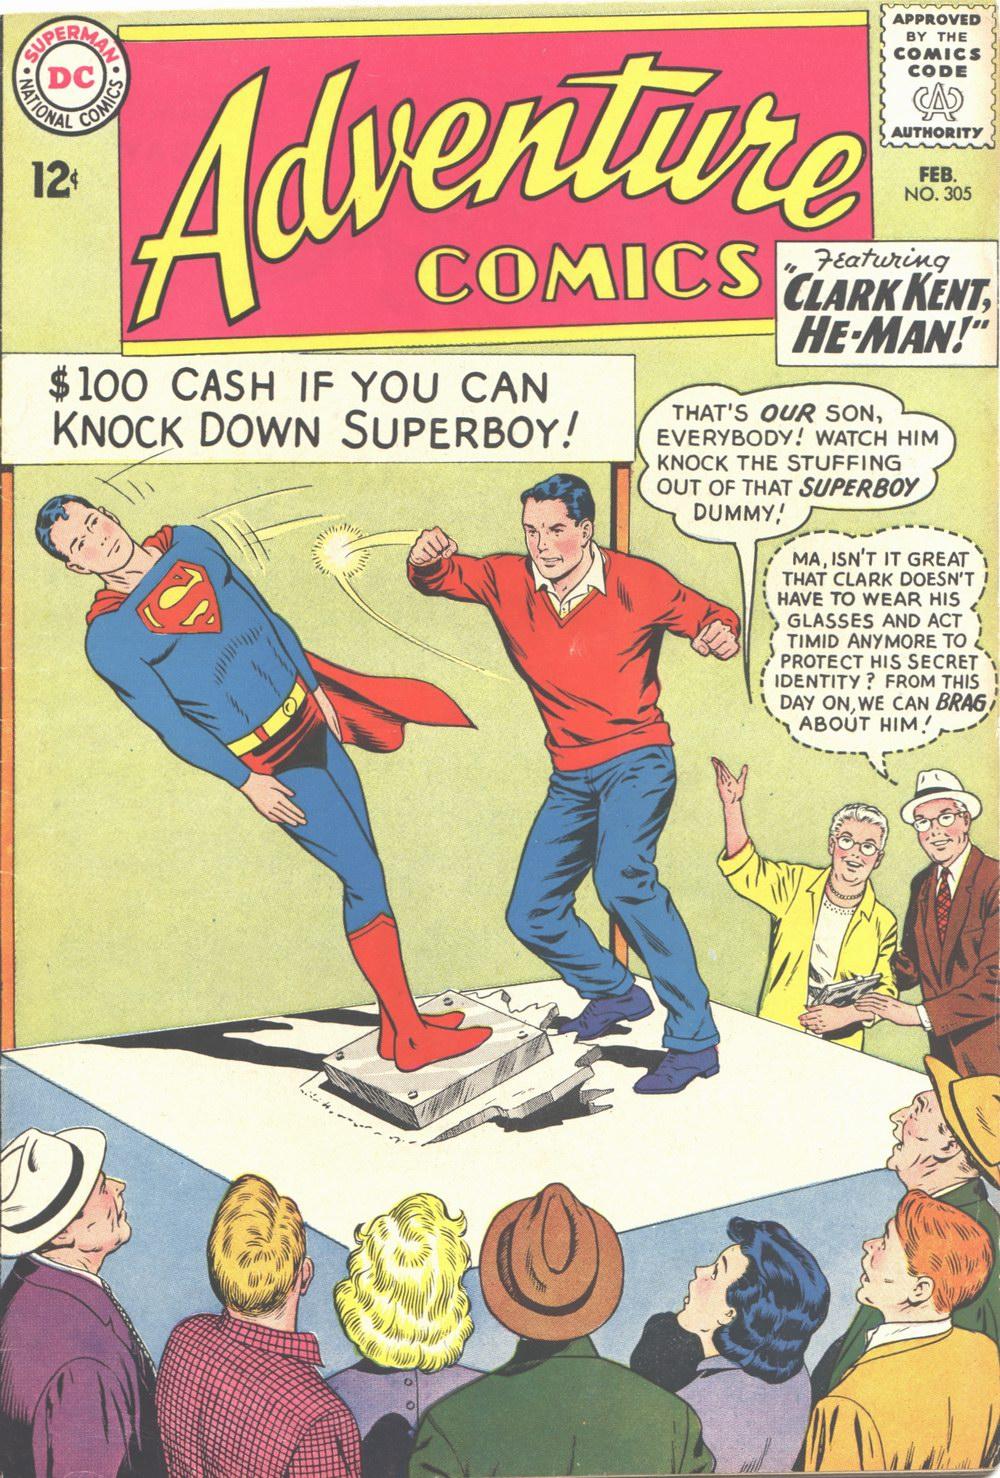 Read online Adventure Comics (1938) comic -  Issue #305 - 1